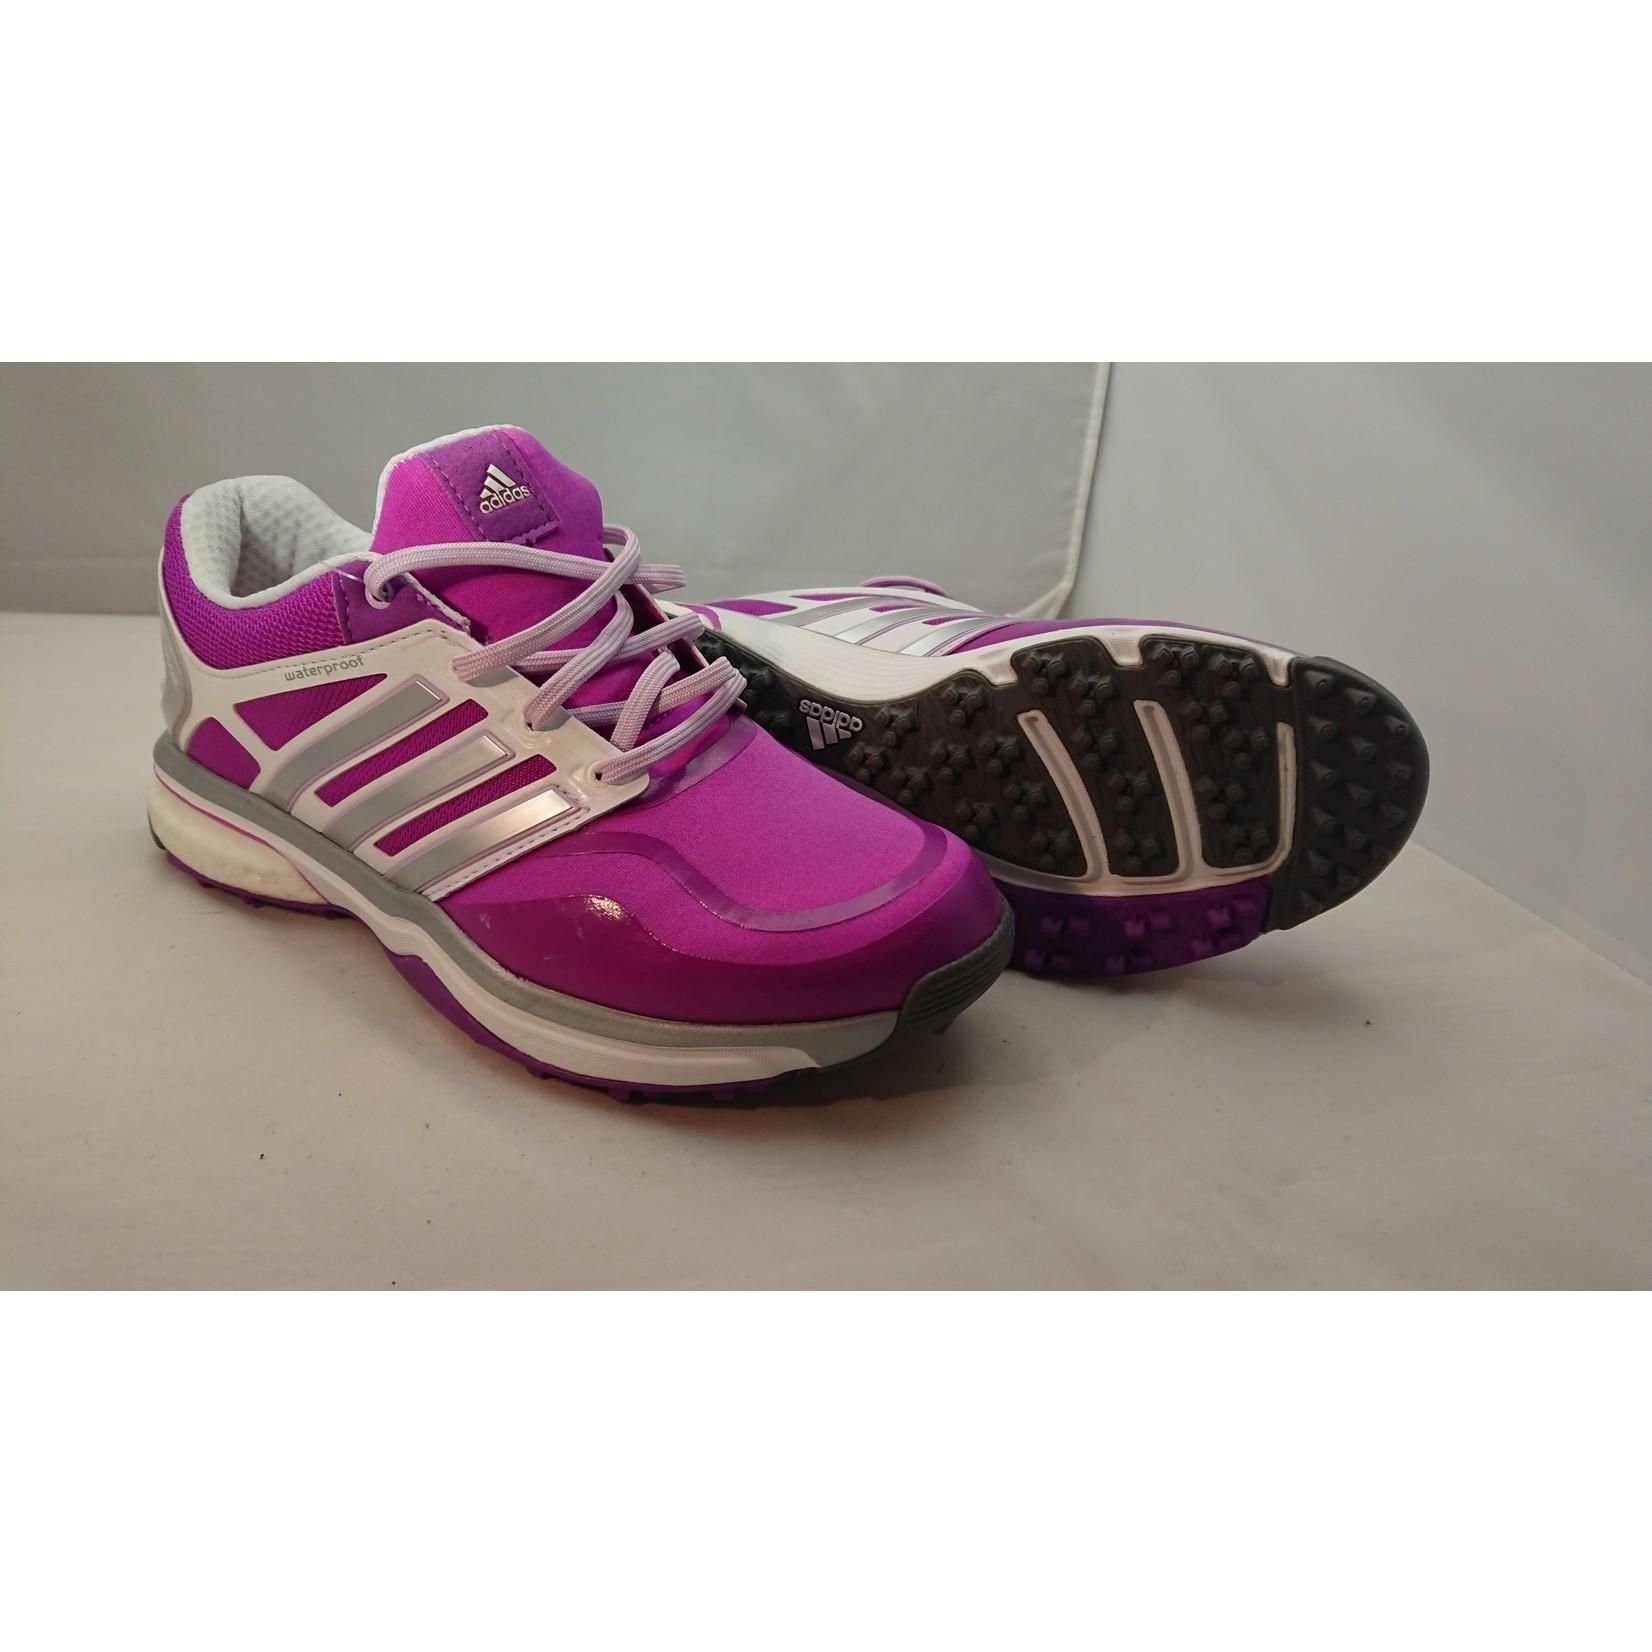 Adidas W adipower s Boost paars 37 1/3 / UK4,5